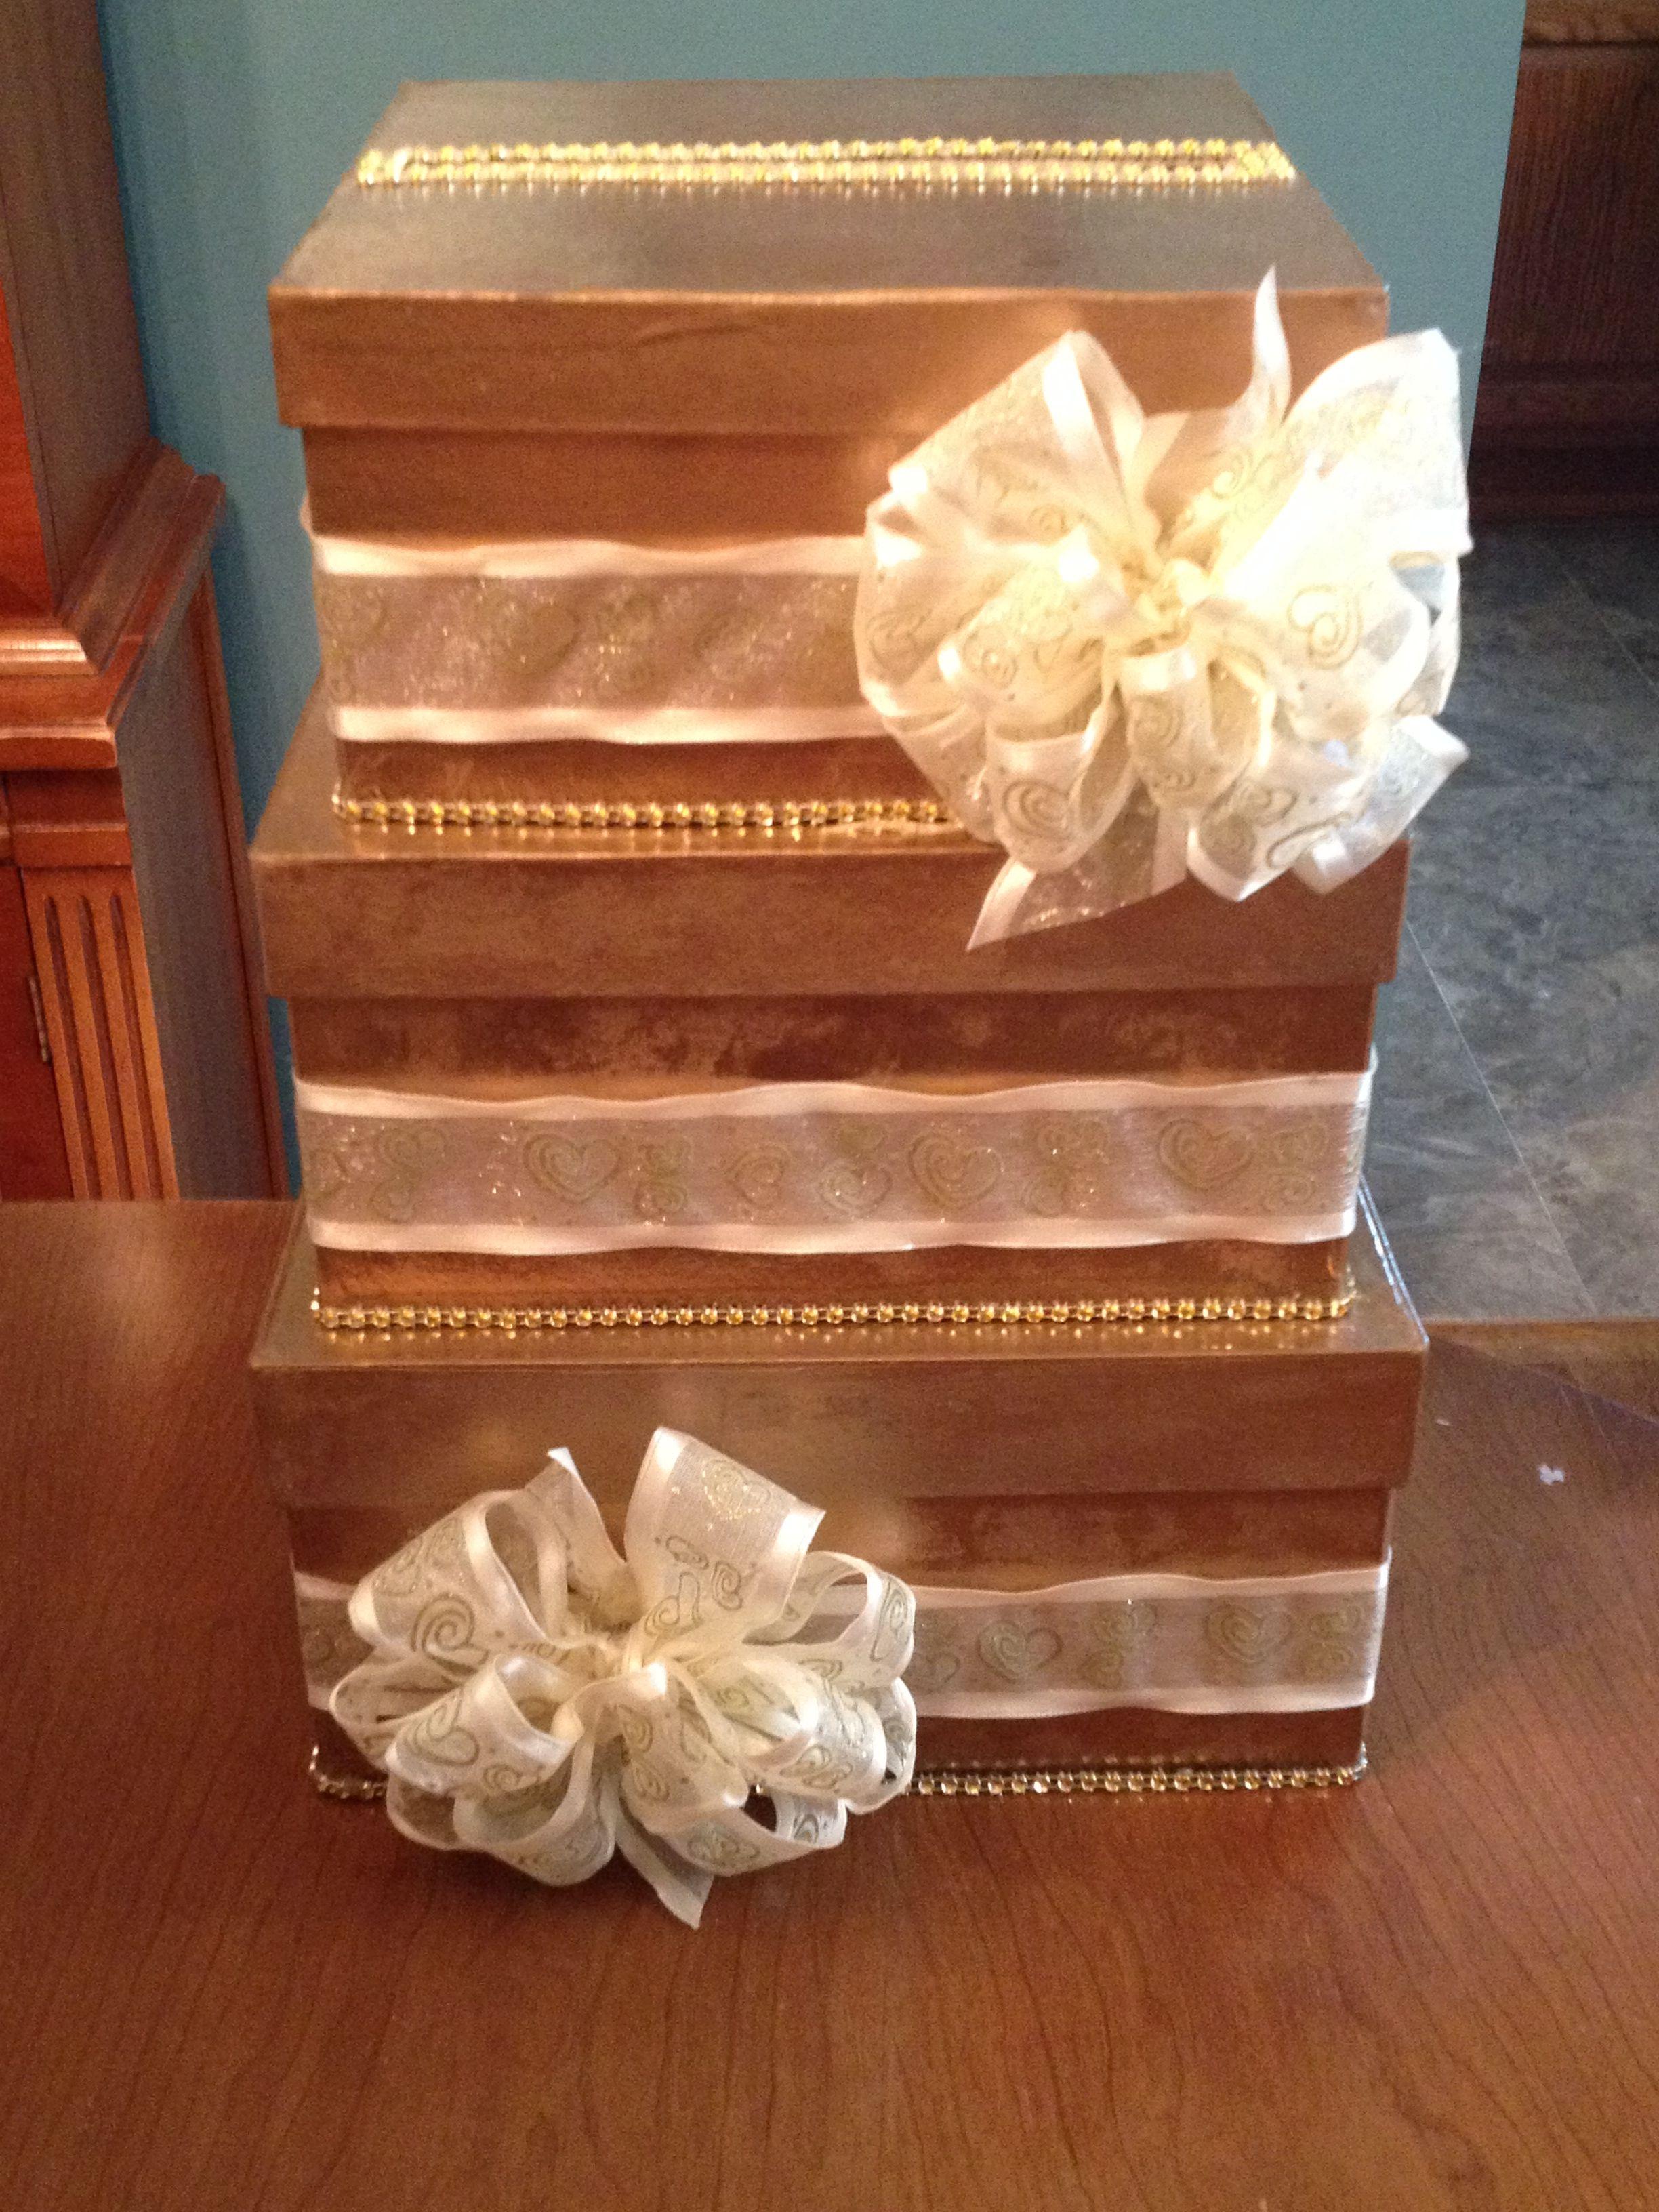 Pinterest Wedding Gift Card Holder : Pin Wedding Card Box Gift Wish Holder on Pinterest